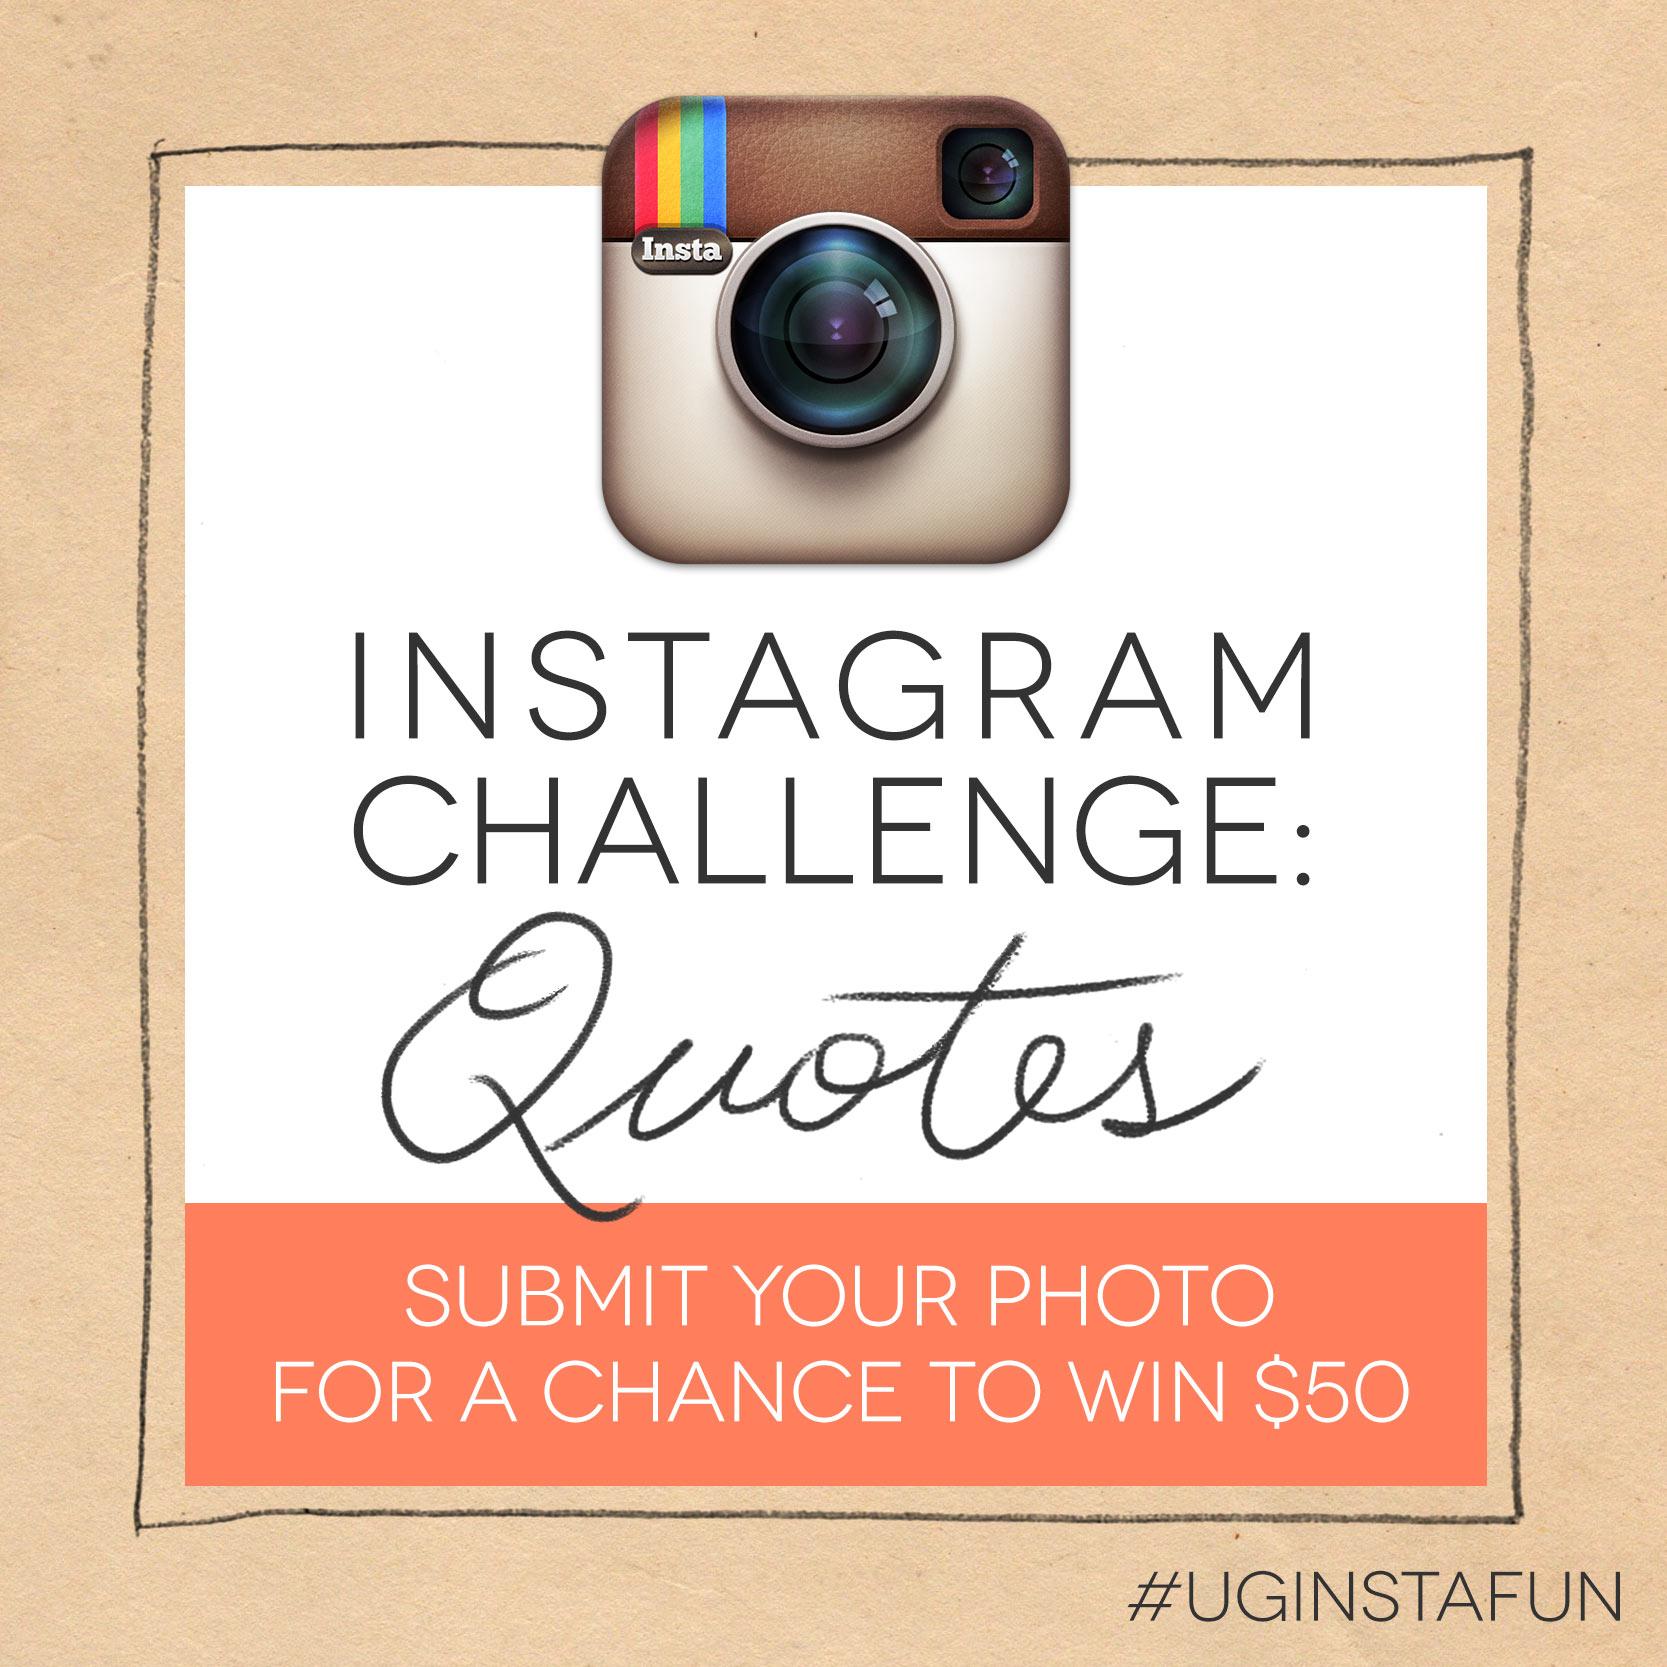 Instagram Challenge: QUOTES -The Goods